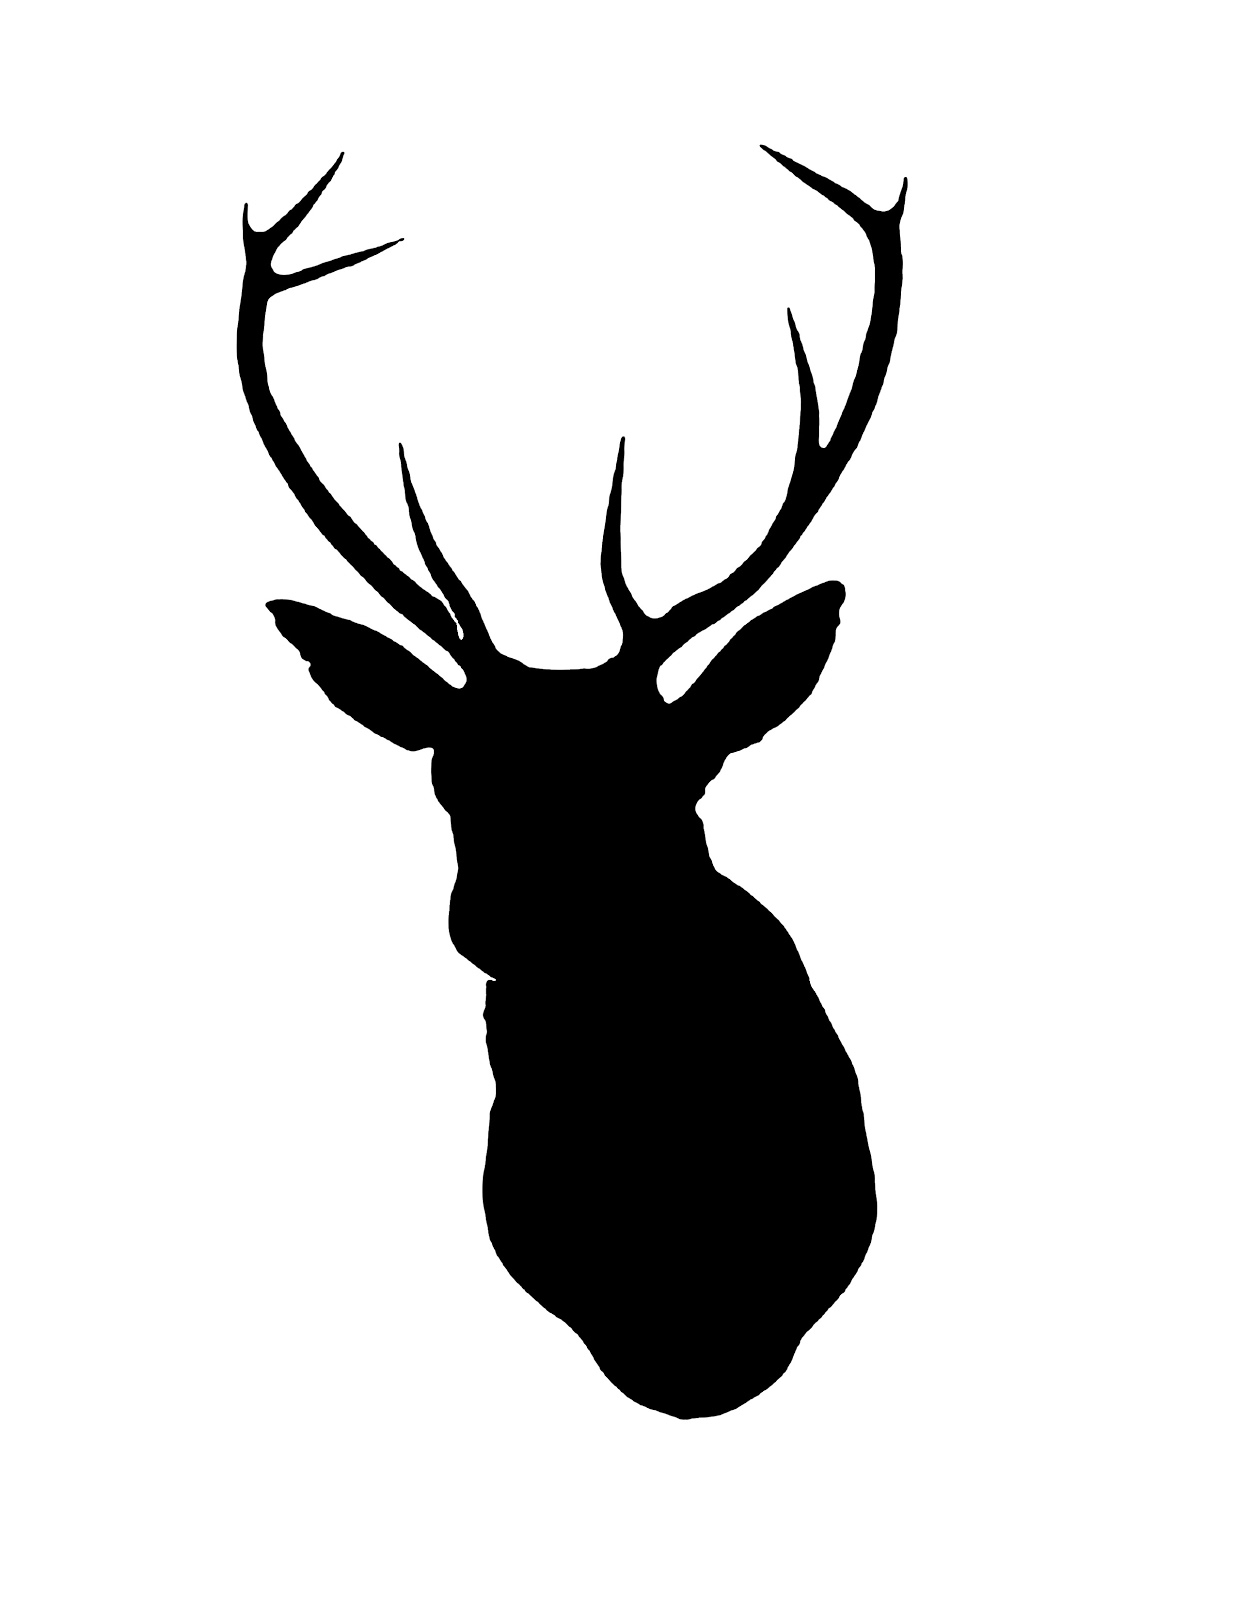 free deer head silhouette clip art - photo #19